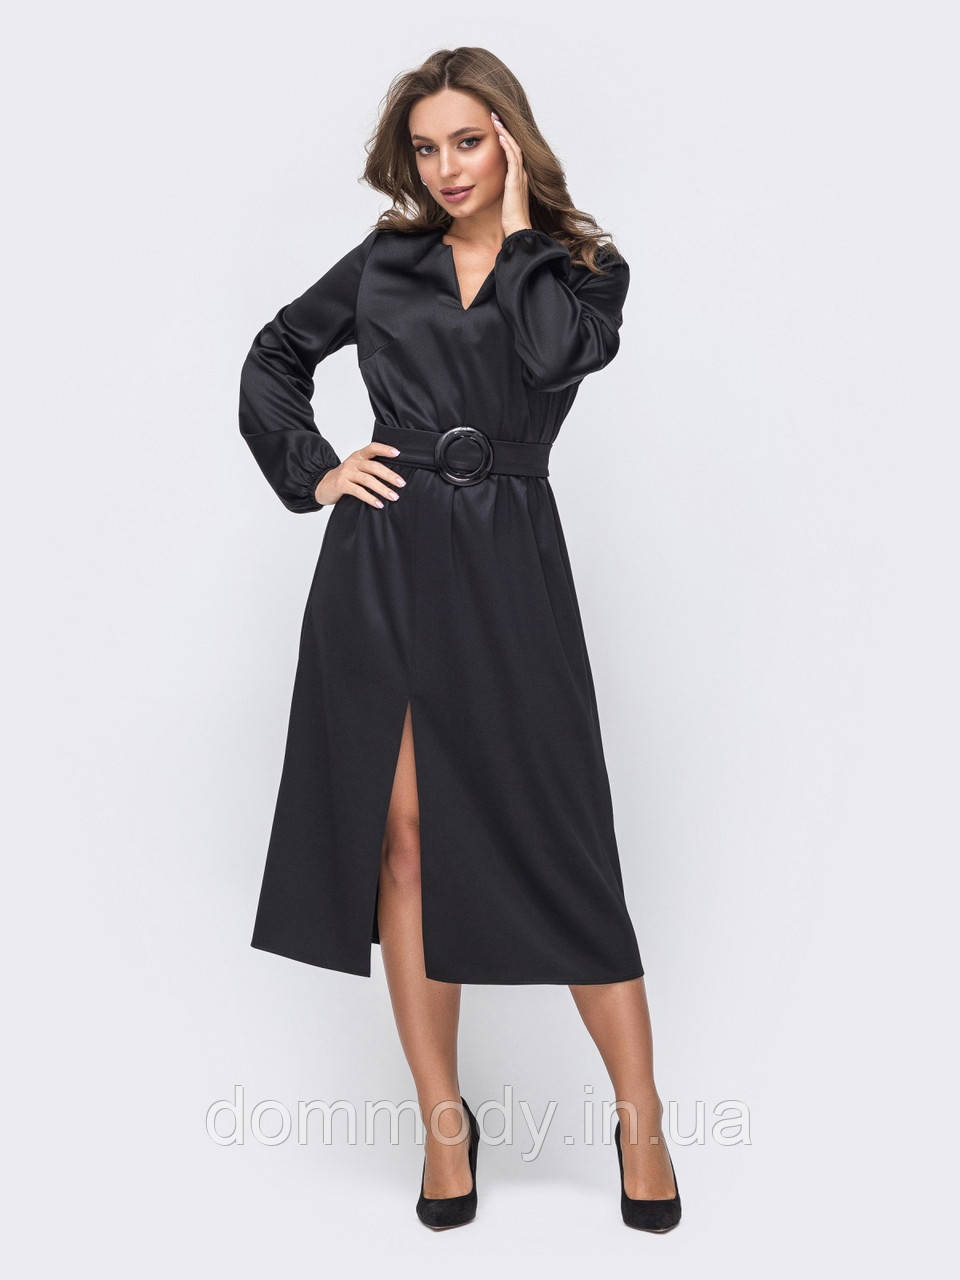 Платье женское Yvonne black